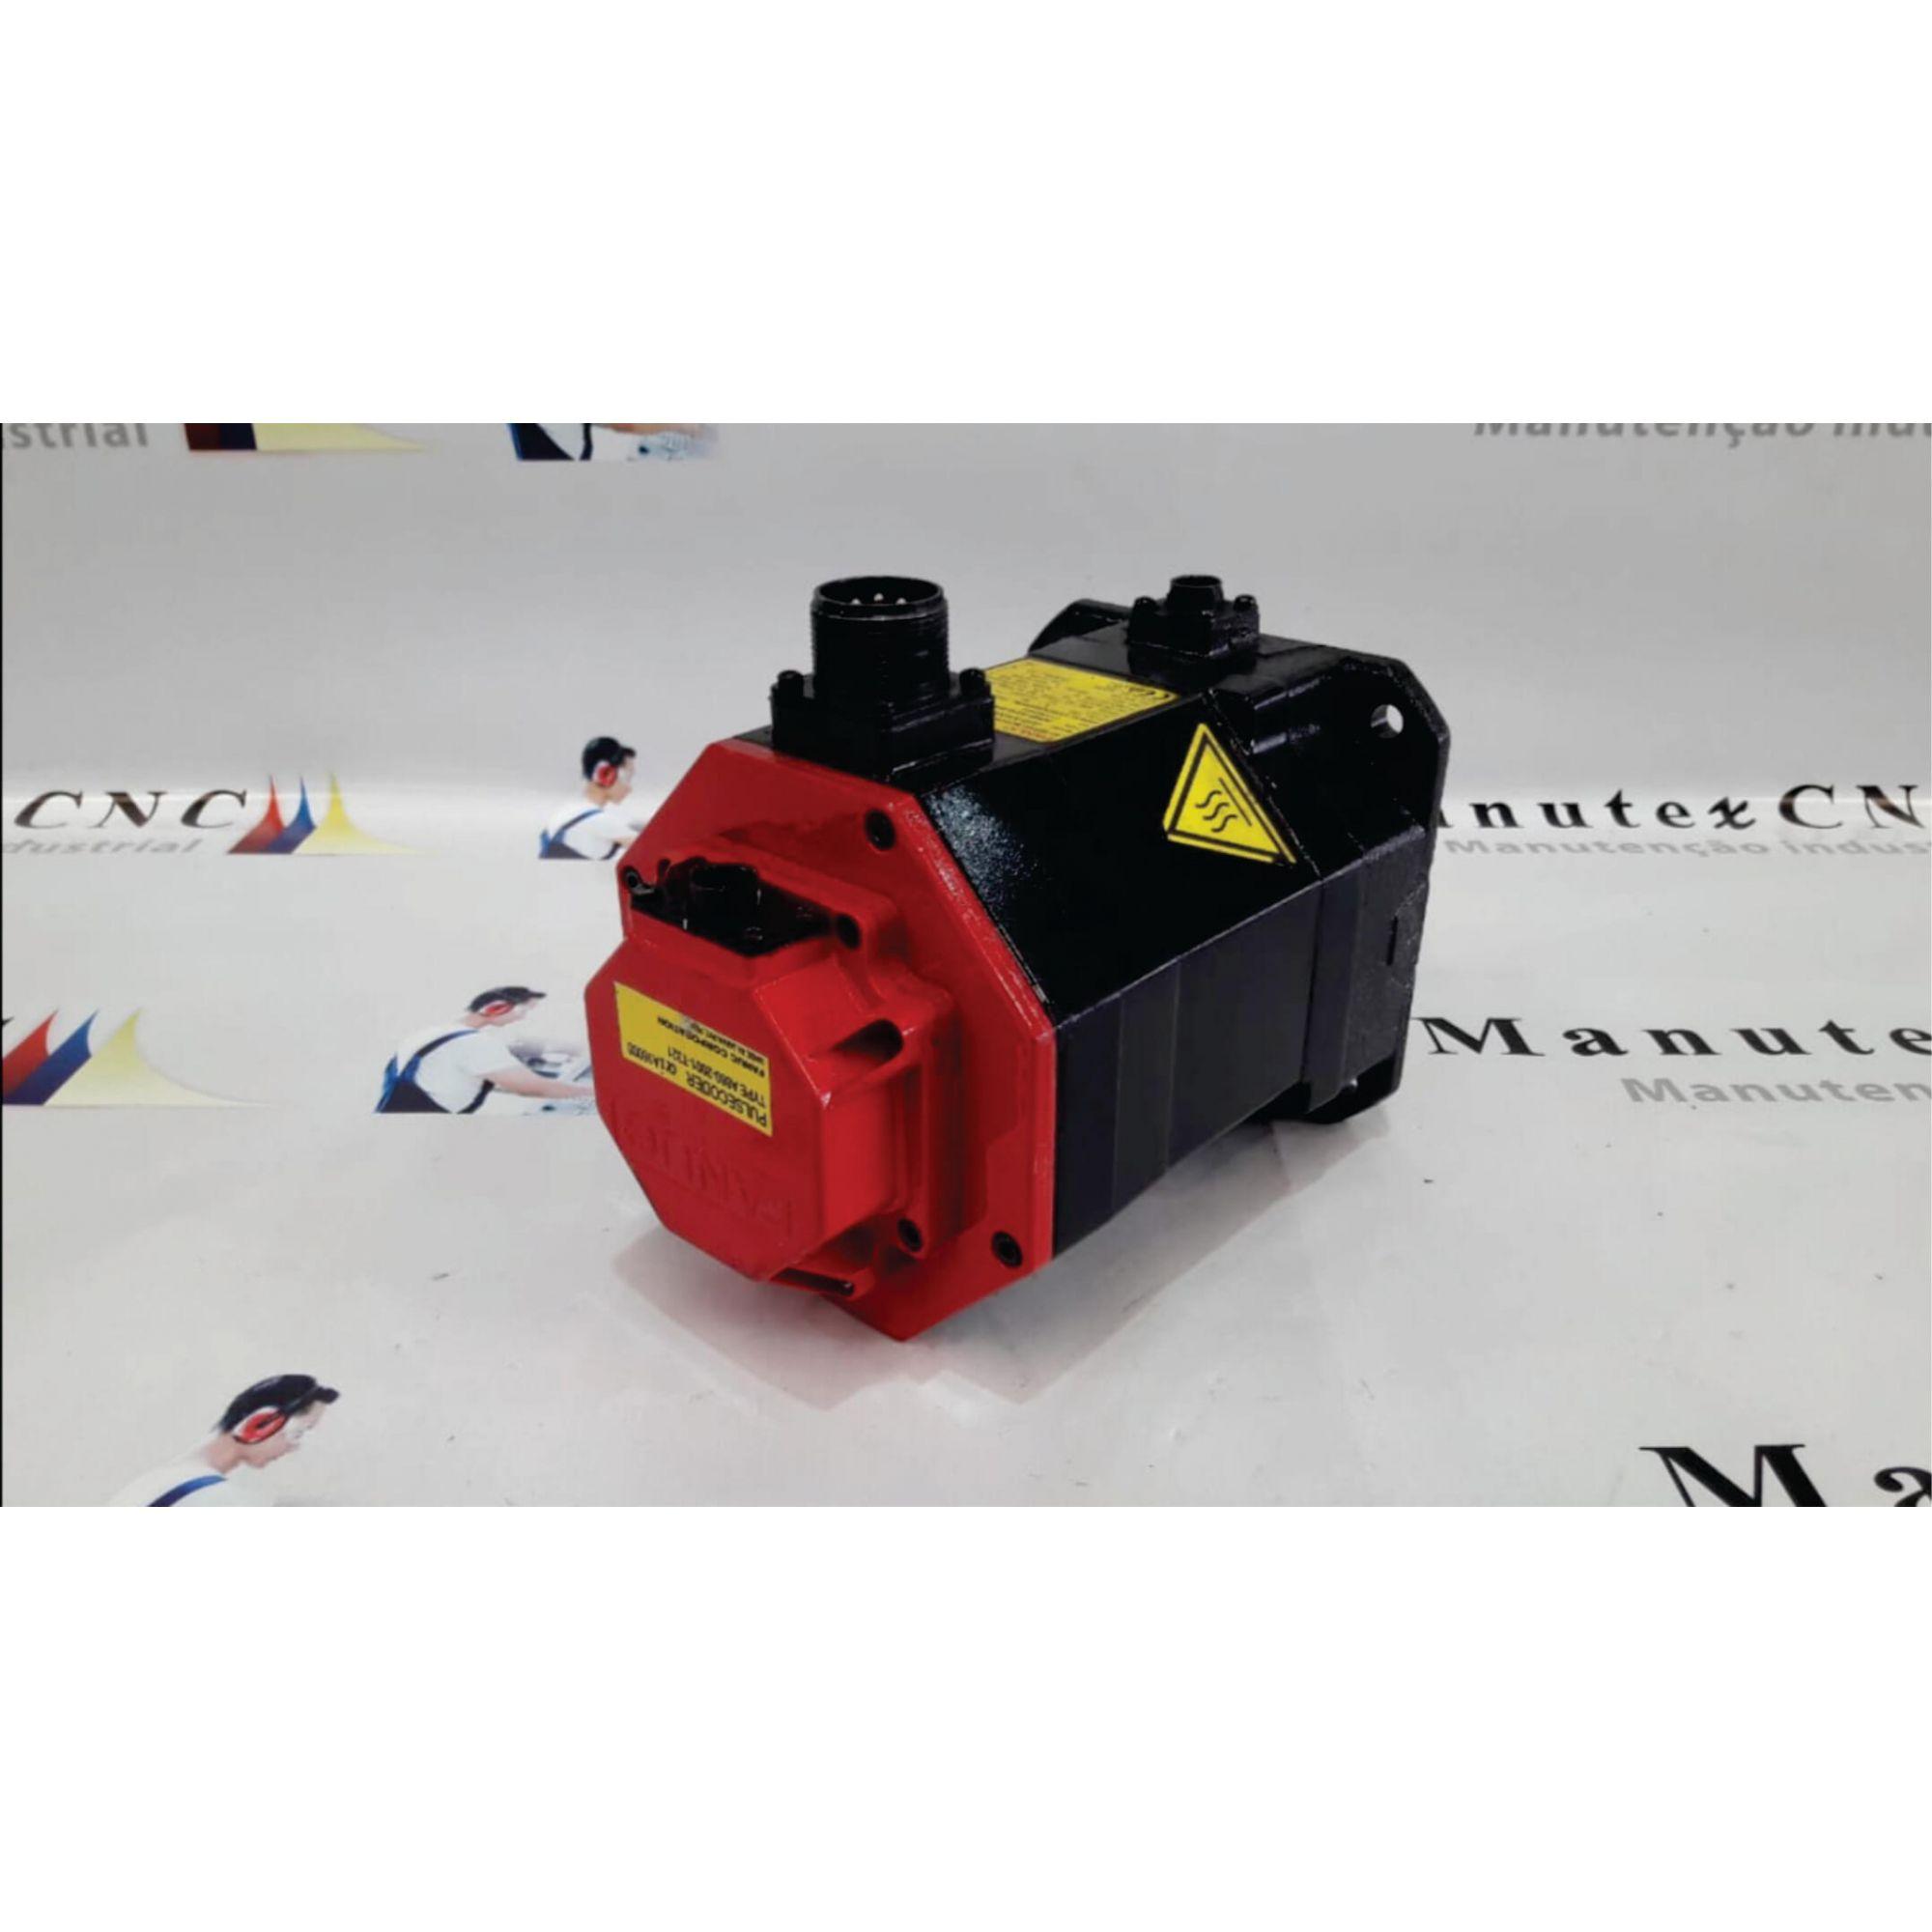 A06B-0235-B502 | SERVO MOTOR | FANUC